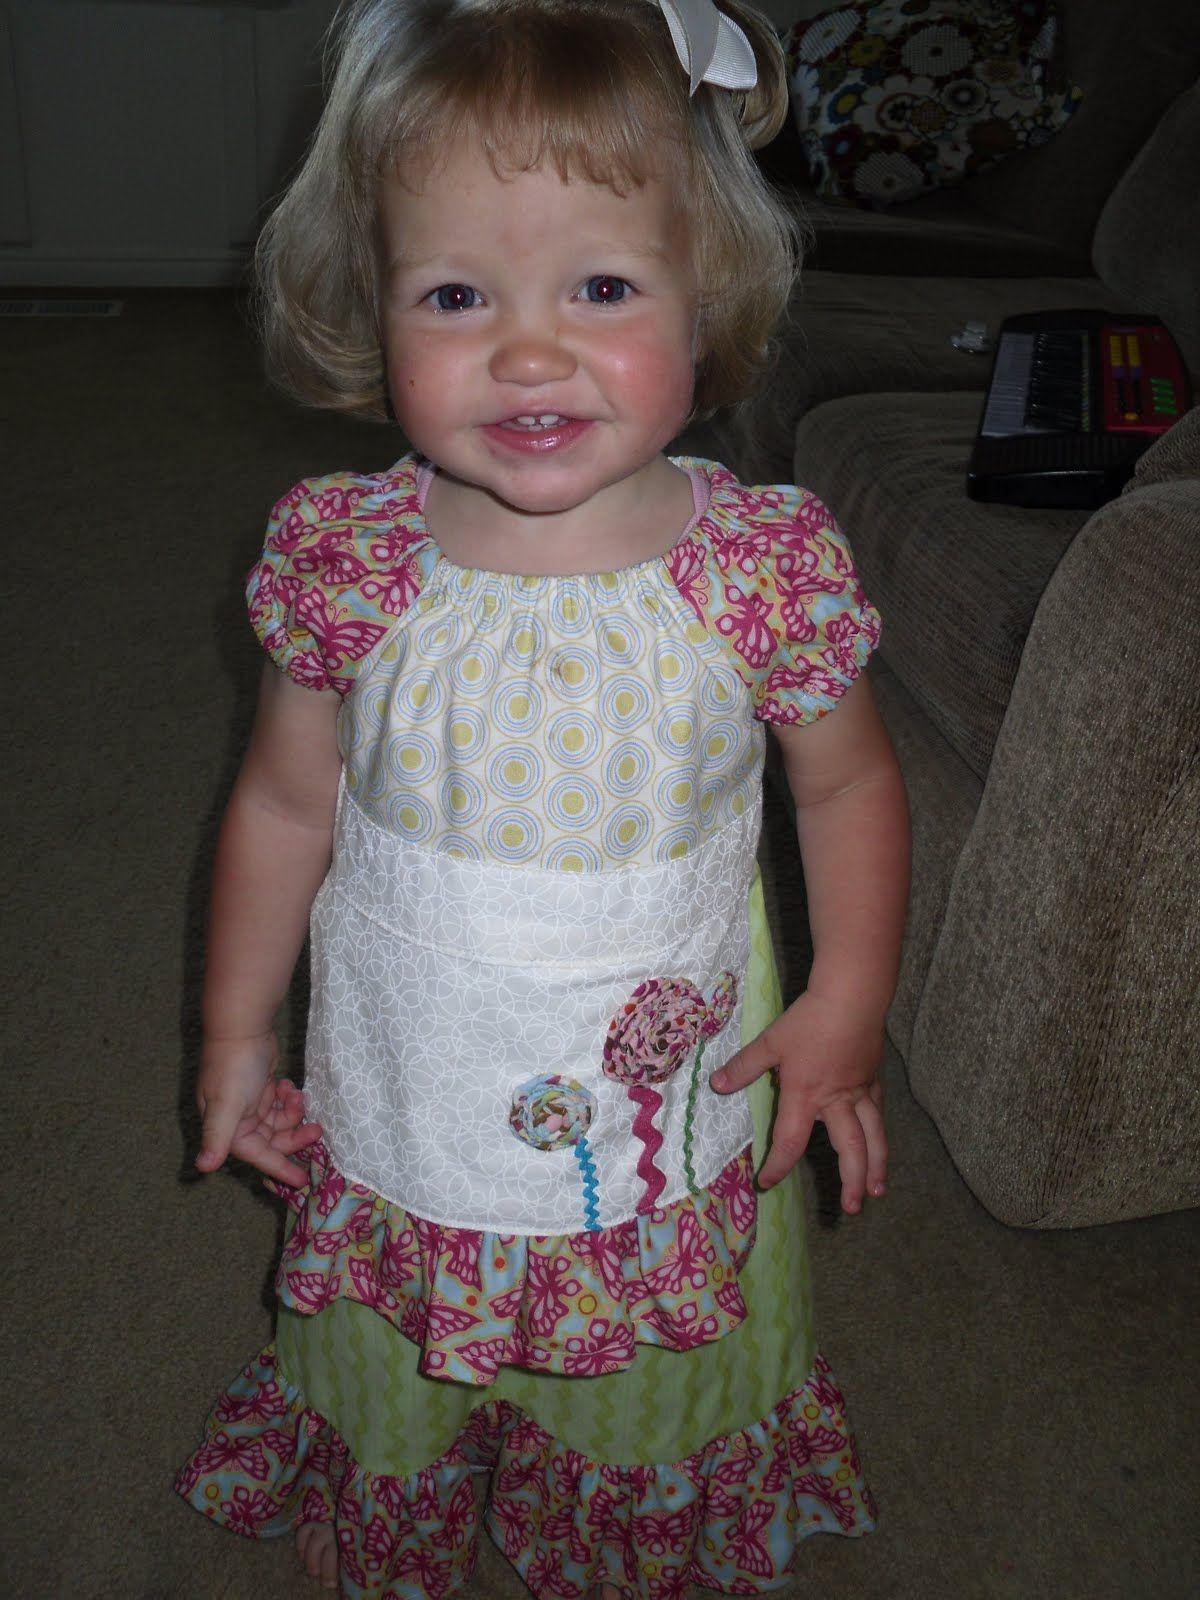 Sandi Henderson's Portabellopixie peasant dress pattern with an apron added.